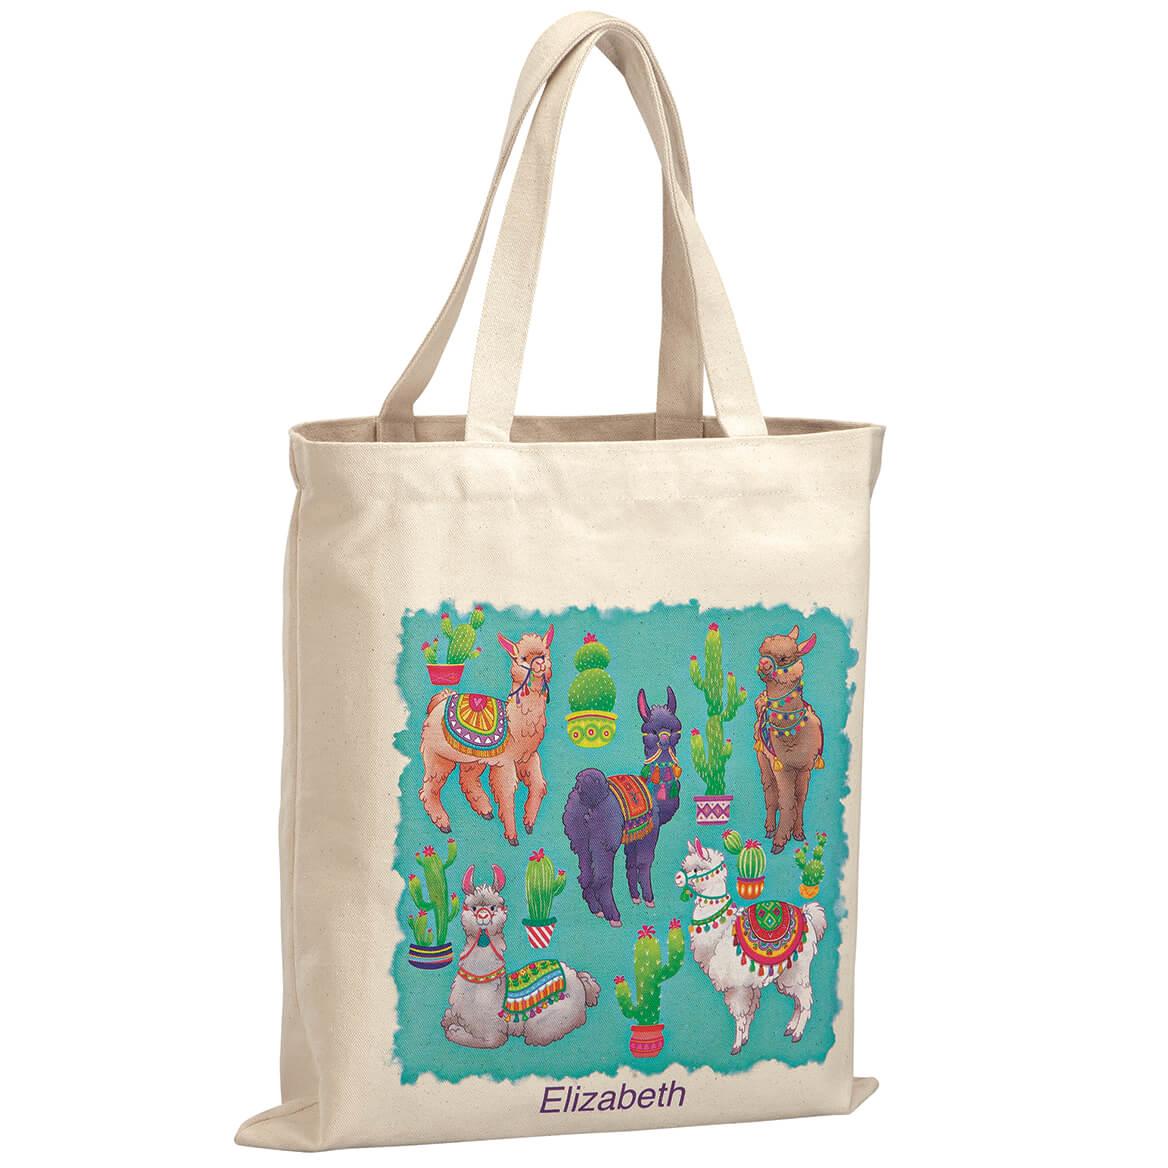 Personalized Llamas Children's Tote-369266